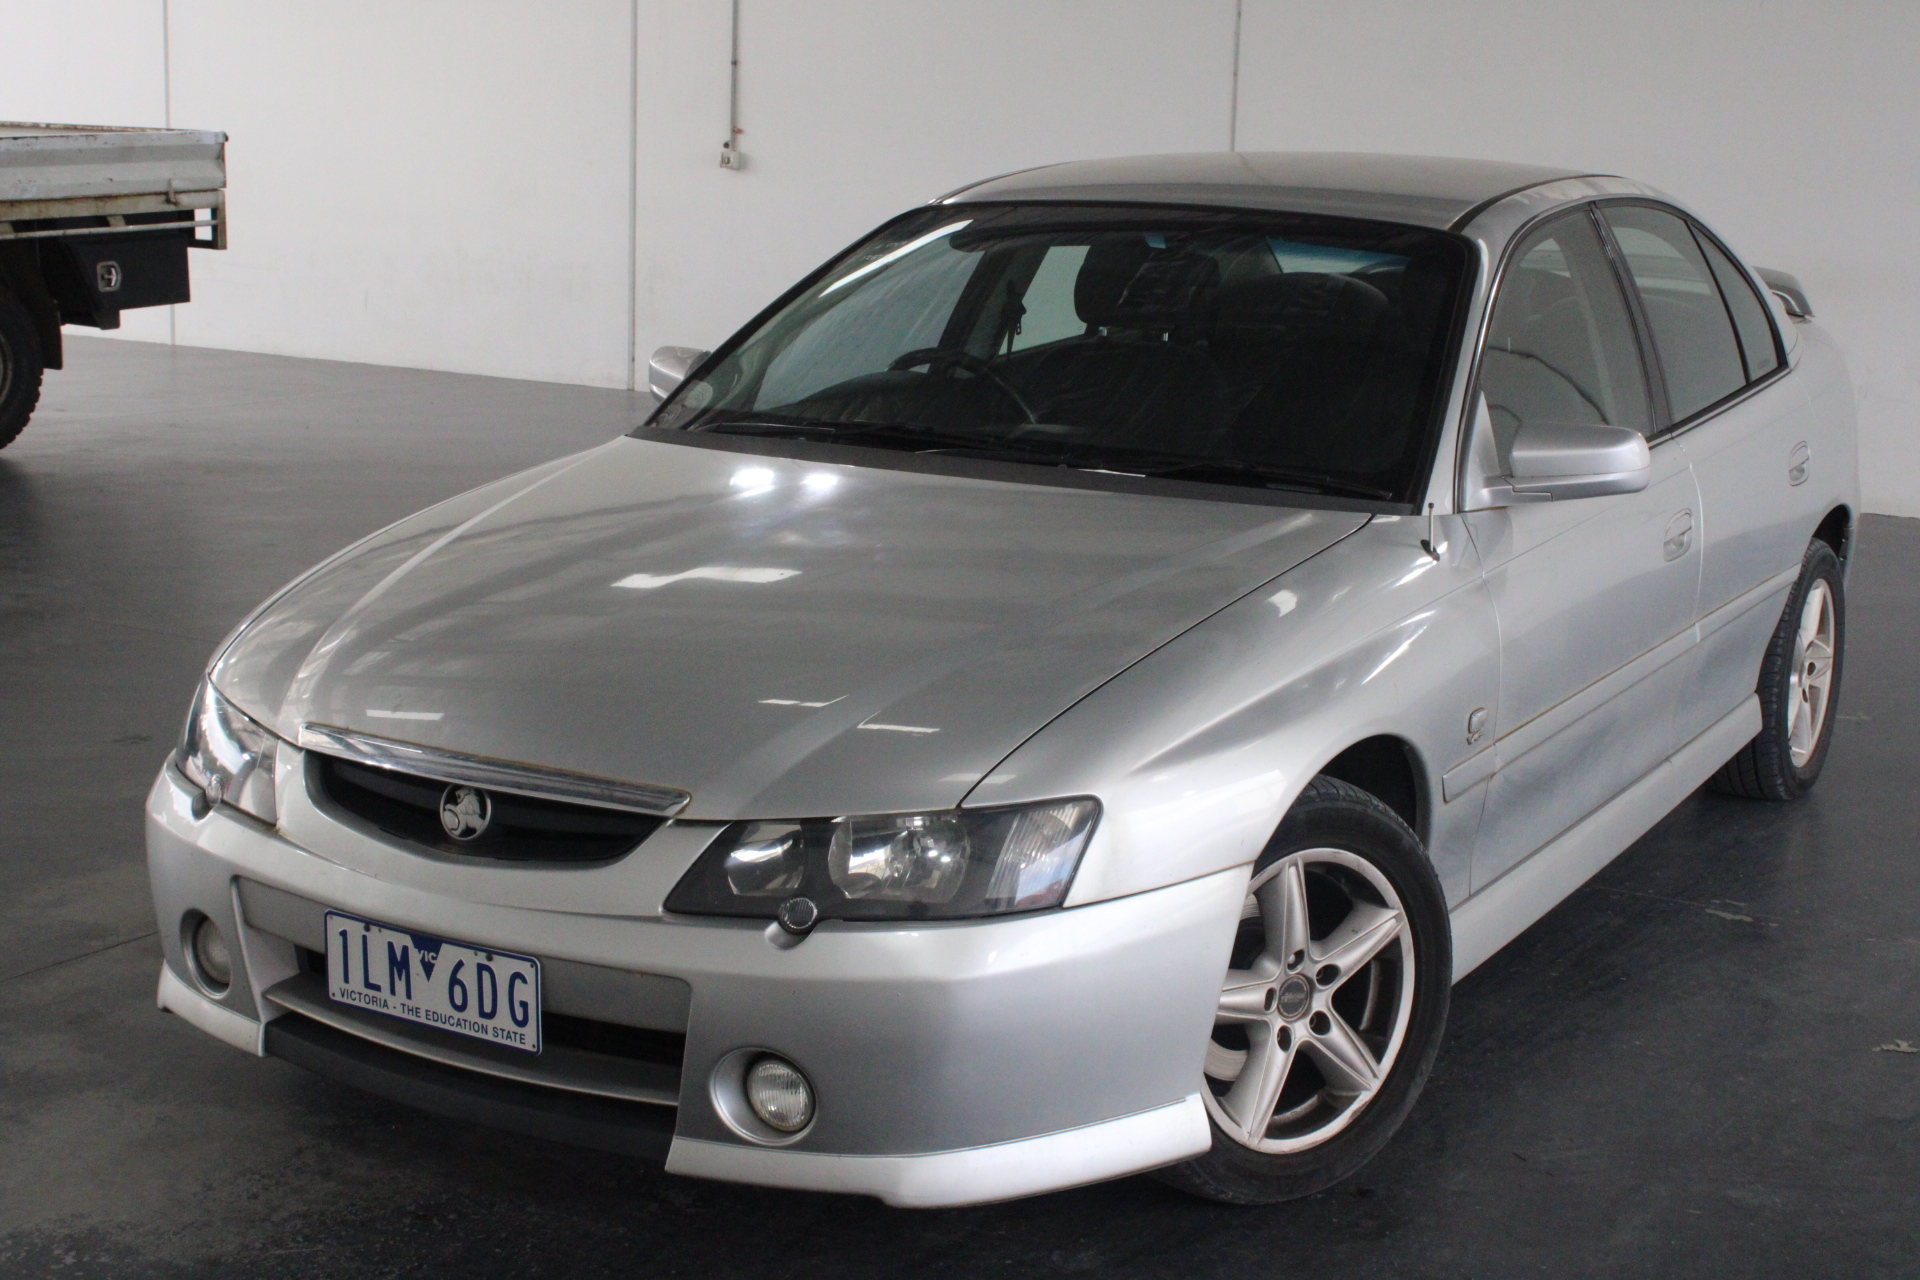 2004 Holden Commodore S Y Series Automatic Sedan